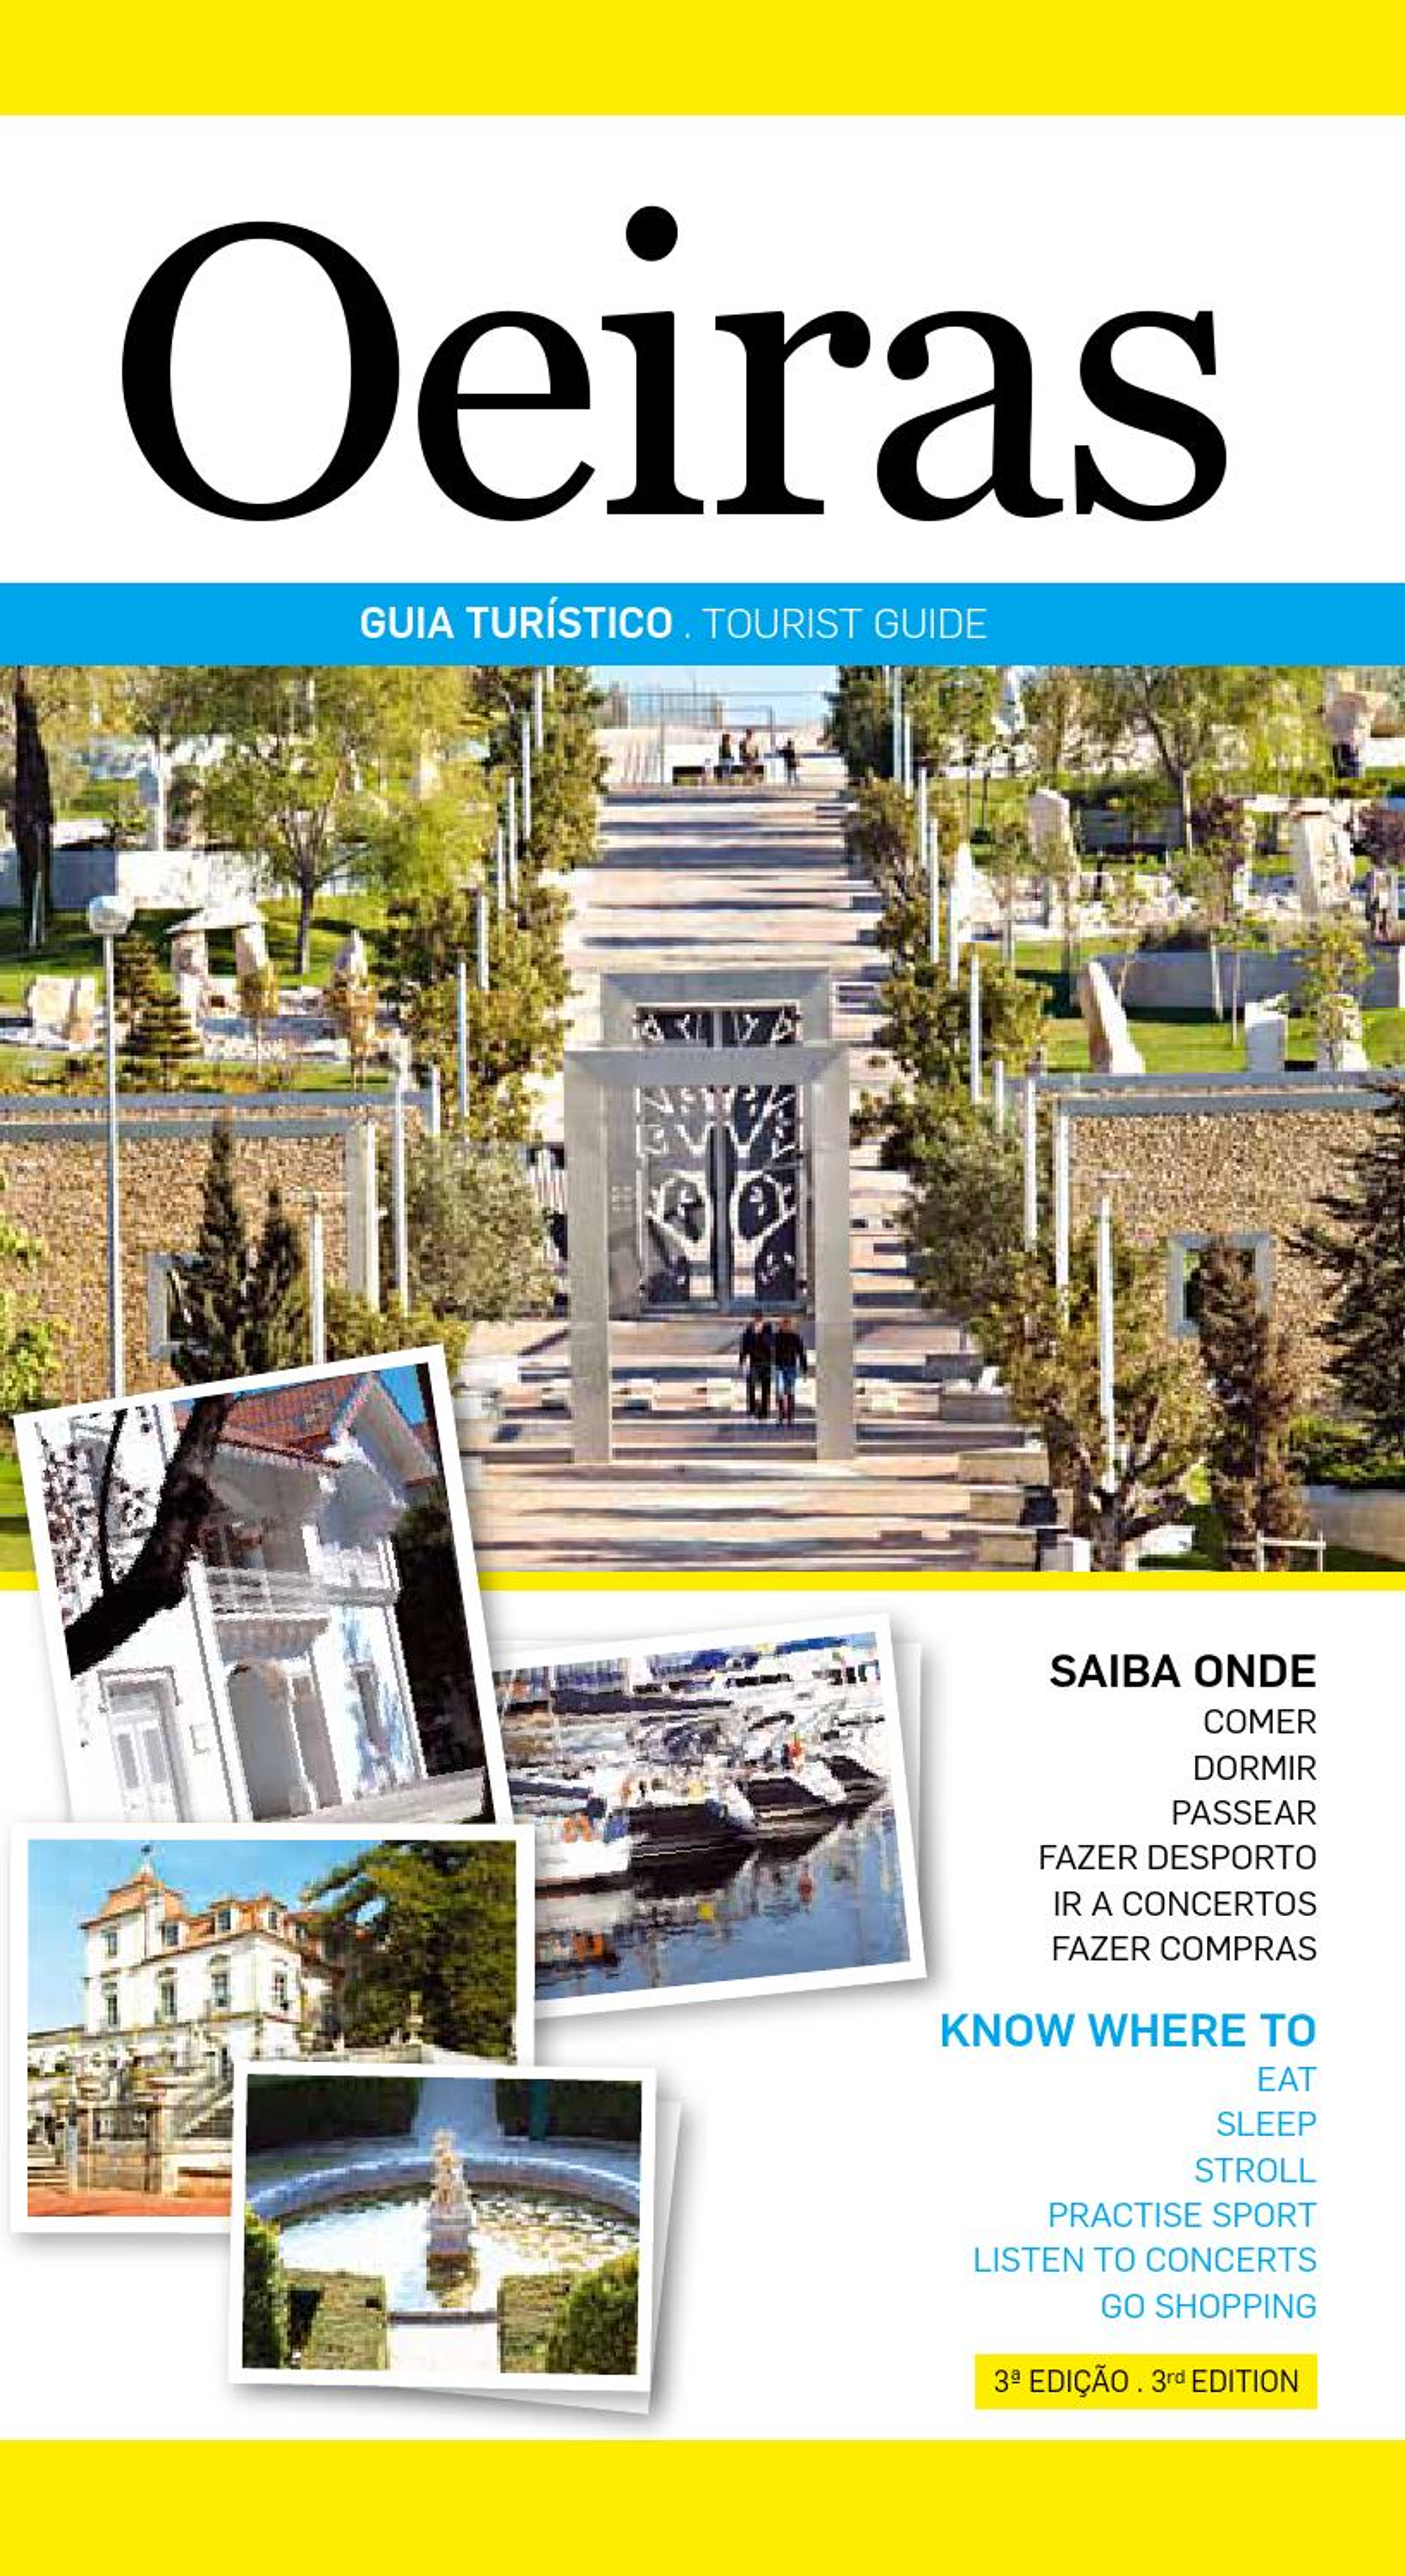 Guia turstico de oeiras by municpio oeiras issuu fandeluxe Images